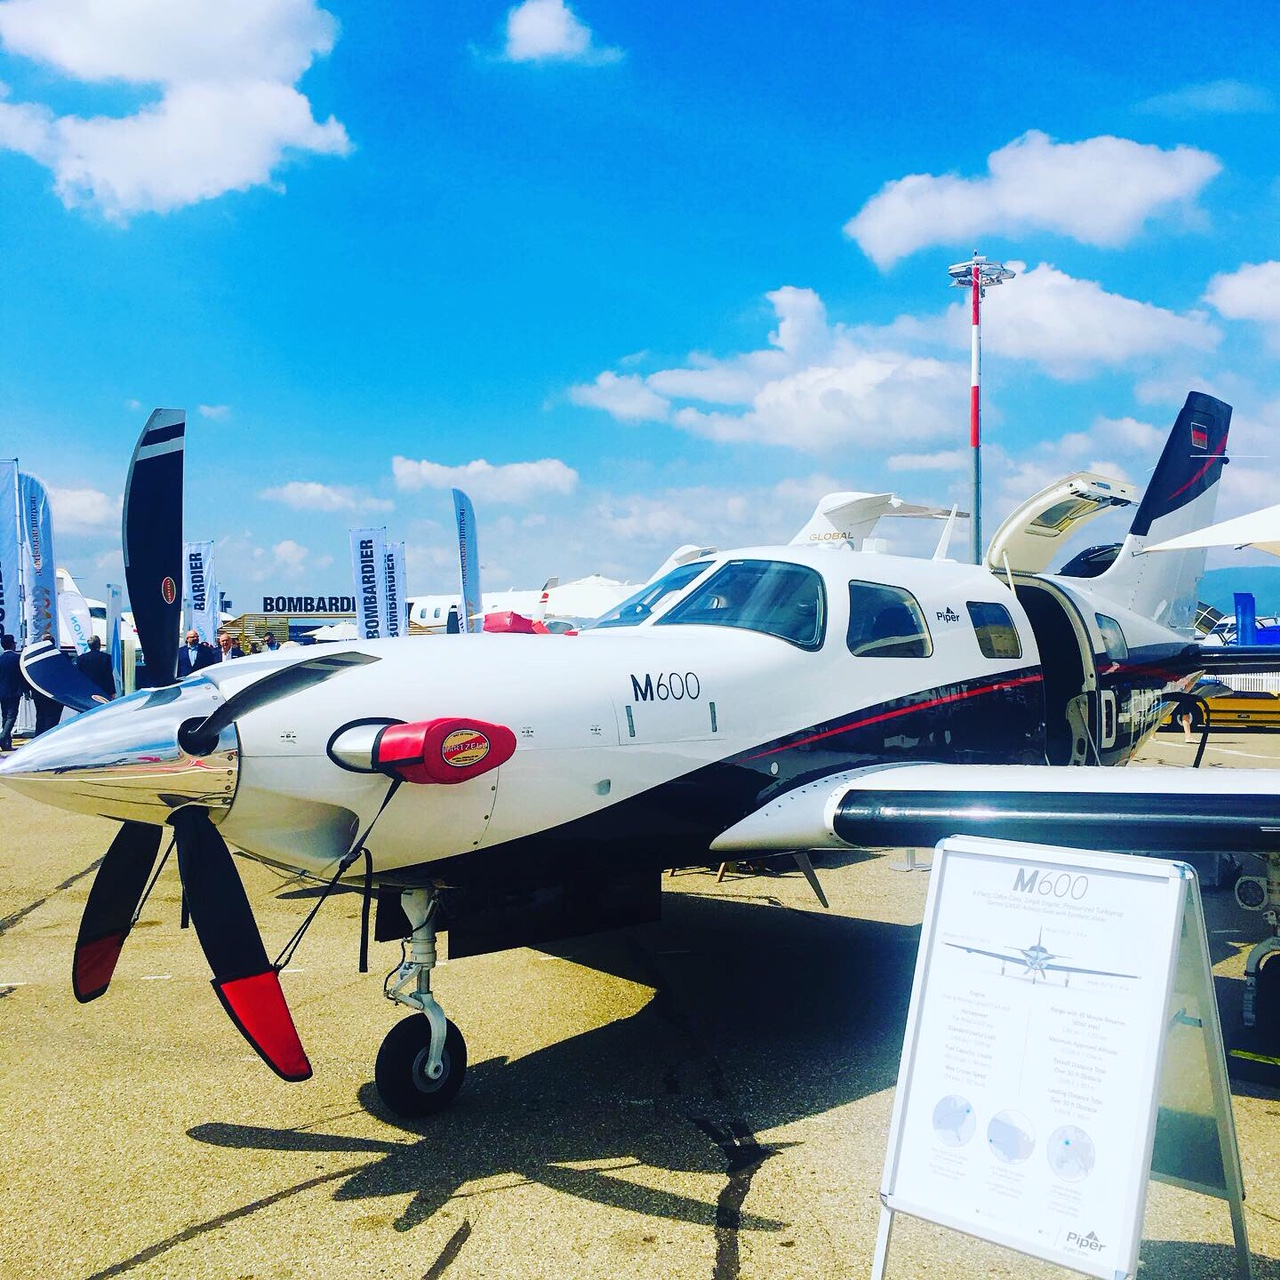 Piper M600 aircraft at a tradeshow event